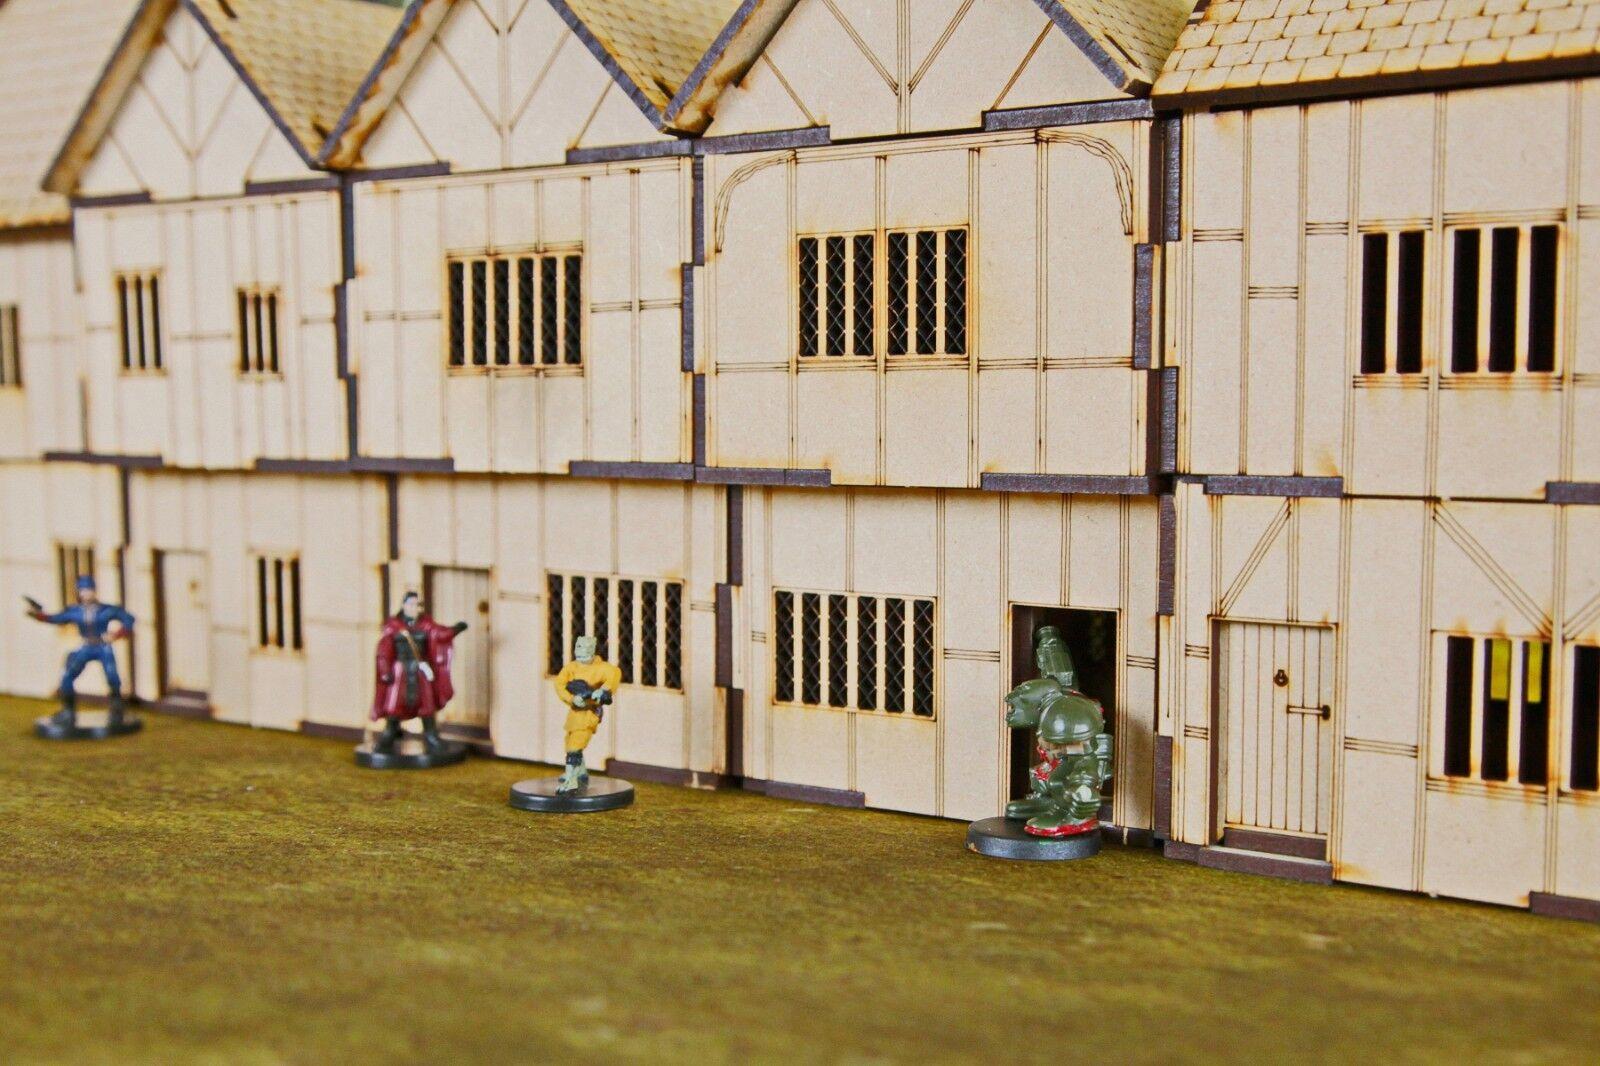 6 Tudor Medieval Buildings - 28mm Modular Buildings for Wargamers & Roleplay